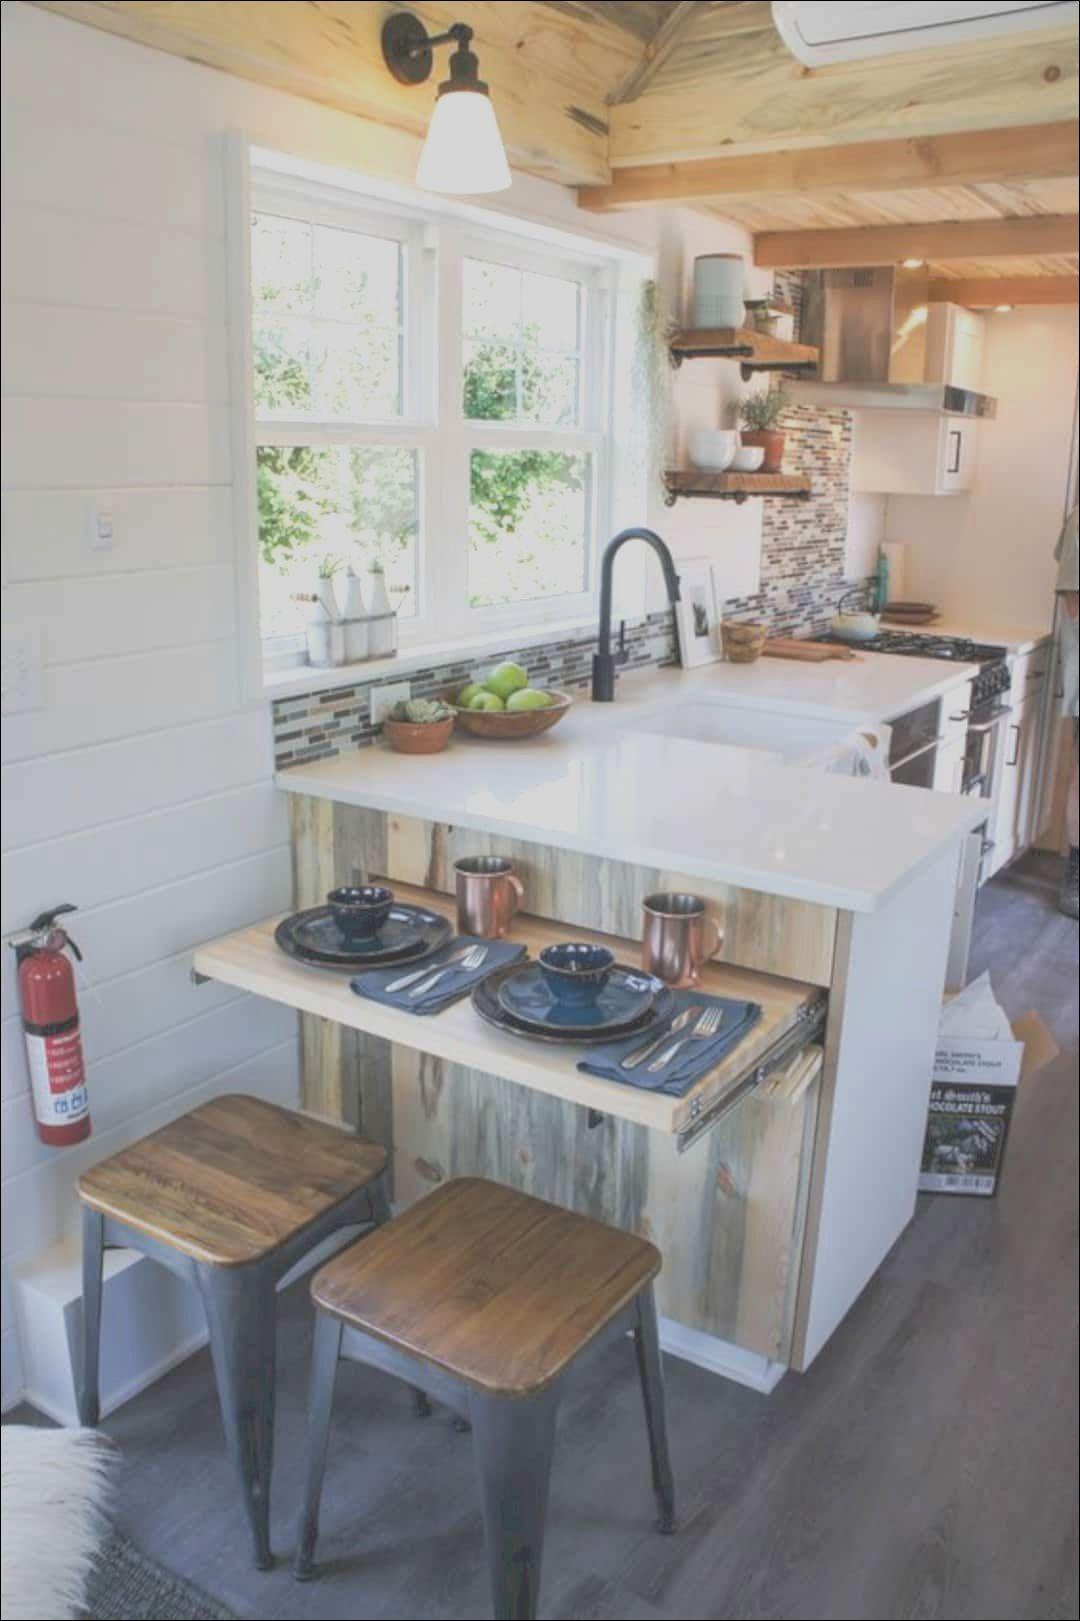 9 Beneficial Interior Design Ideas For Small House Photos In 2020 House Design Kitchen Tiny House Kitchen Tiny House Interior Design